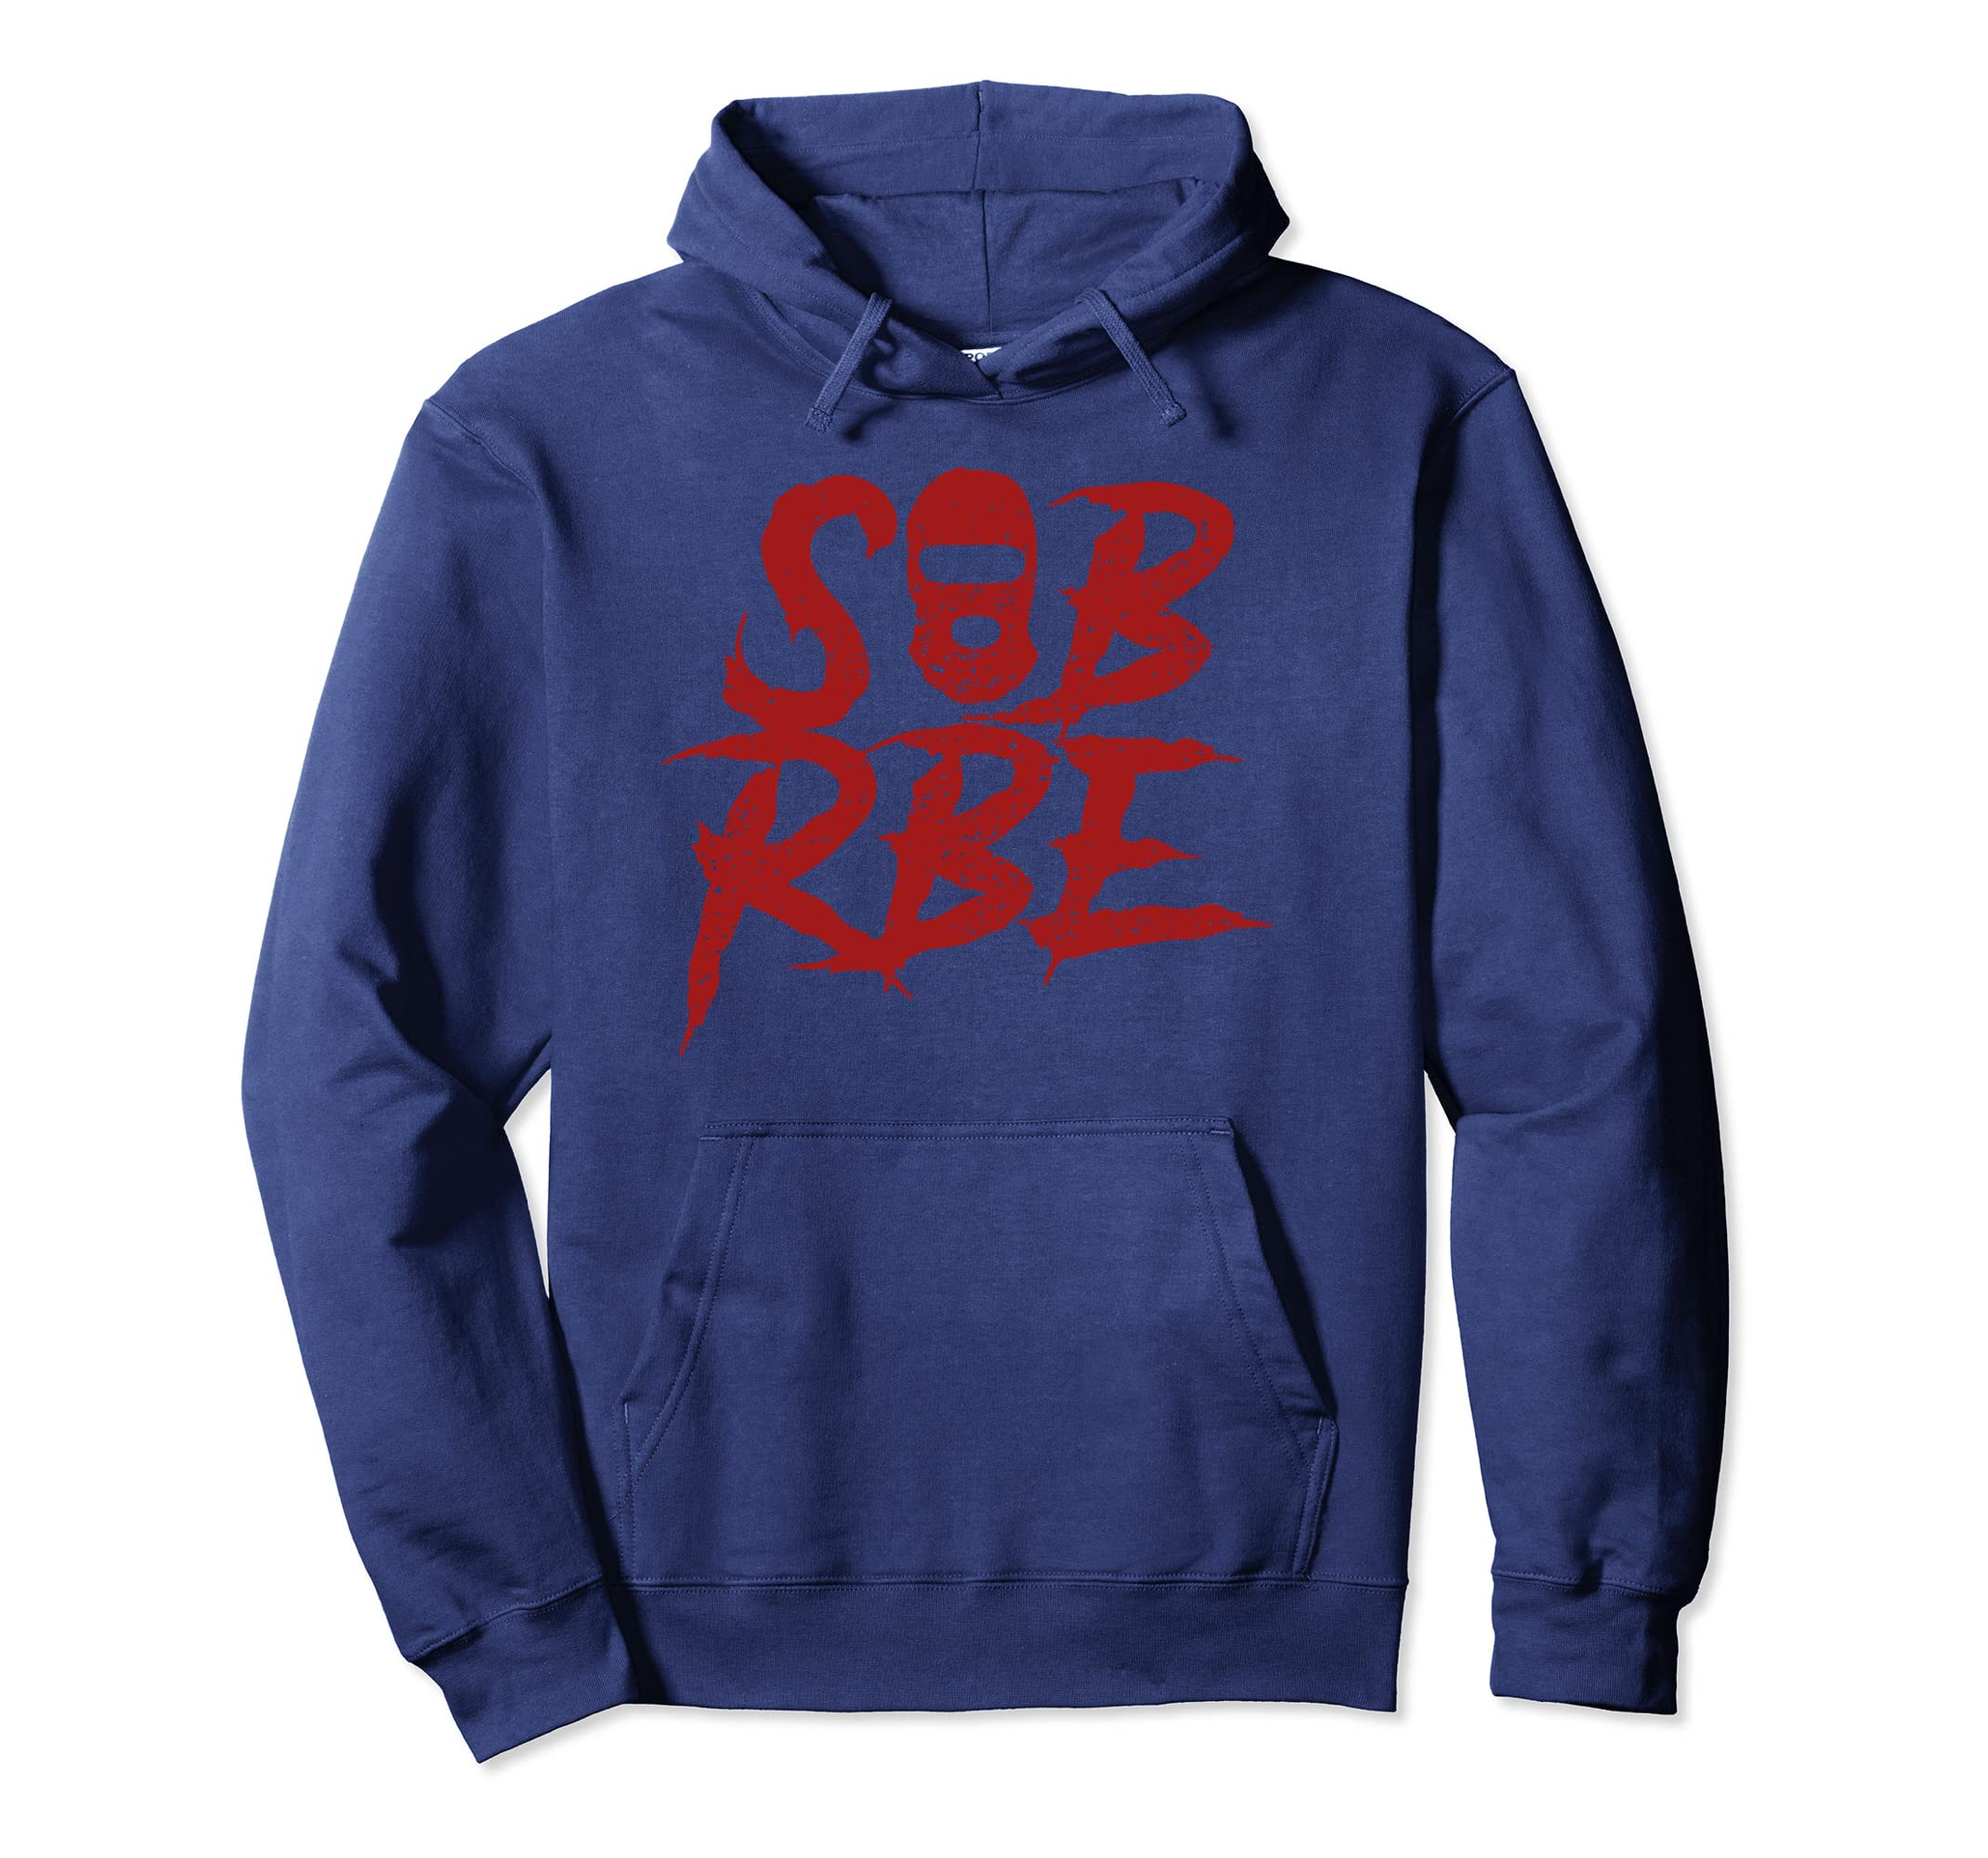 Sob x rbe hoodie-Teechatpro